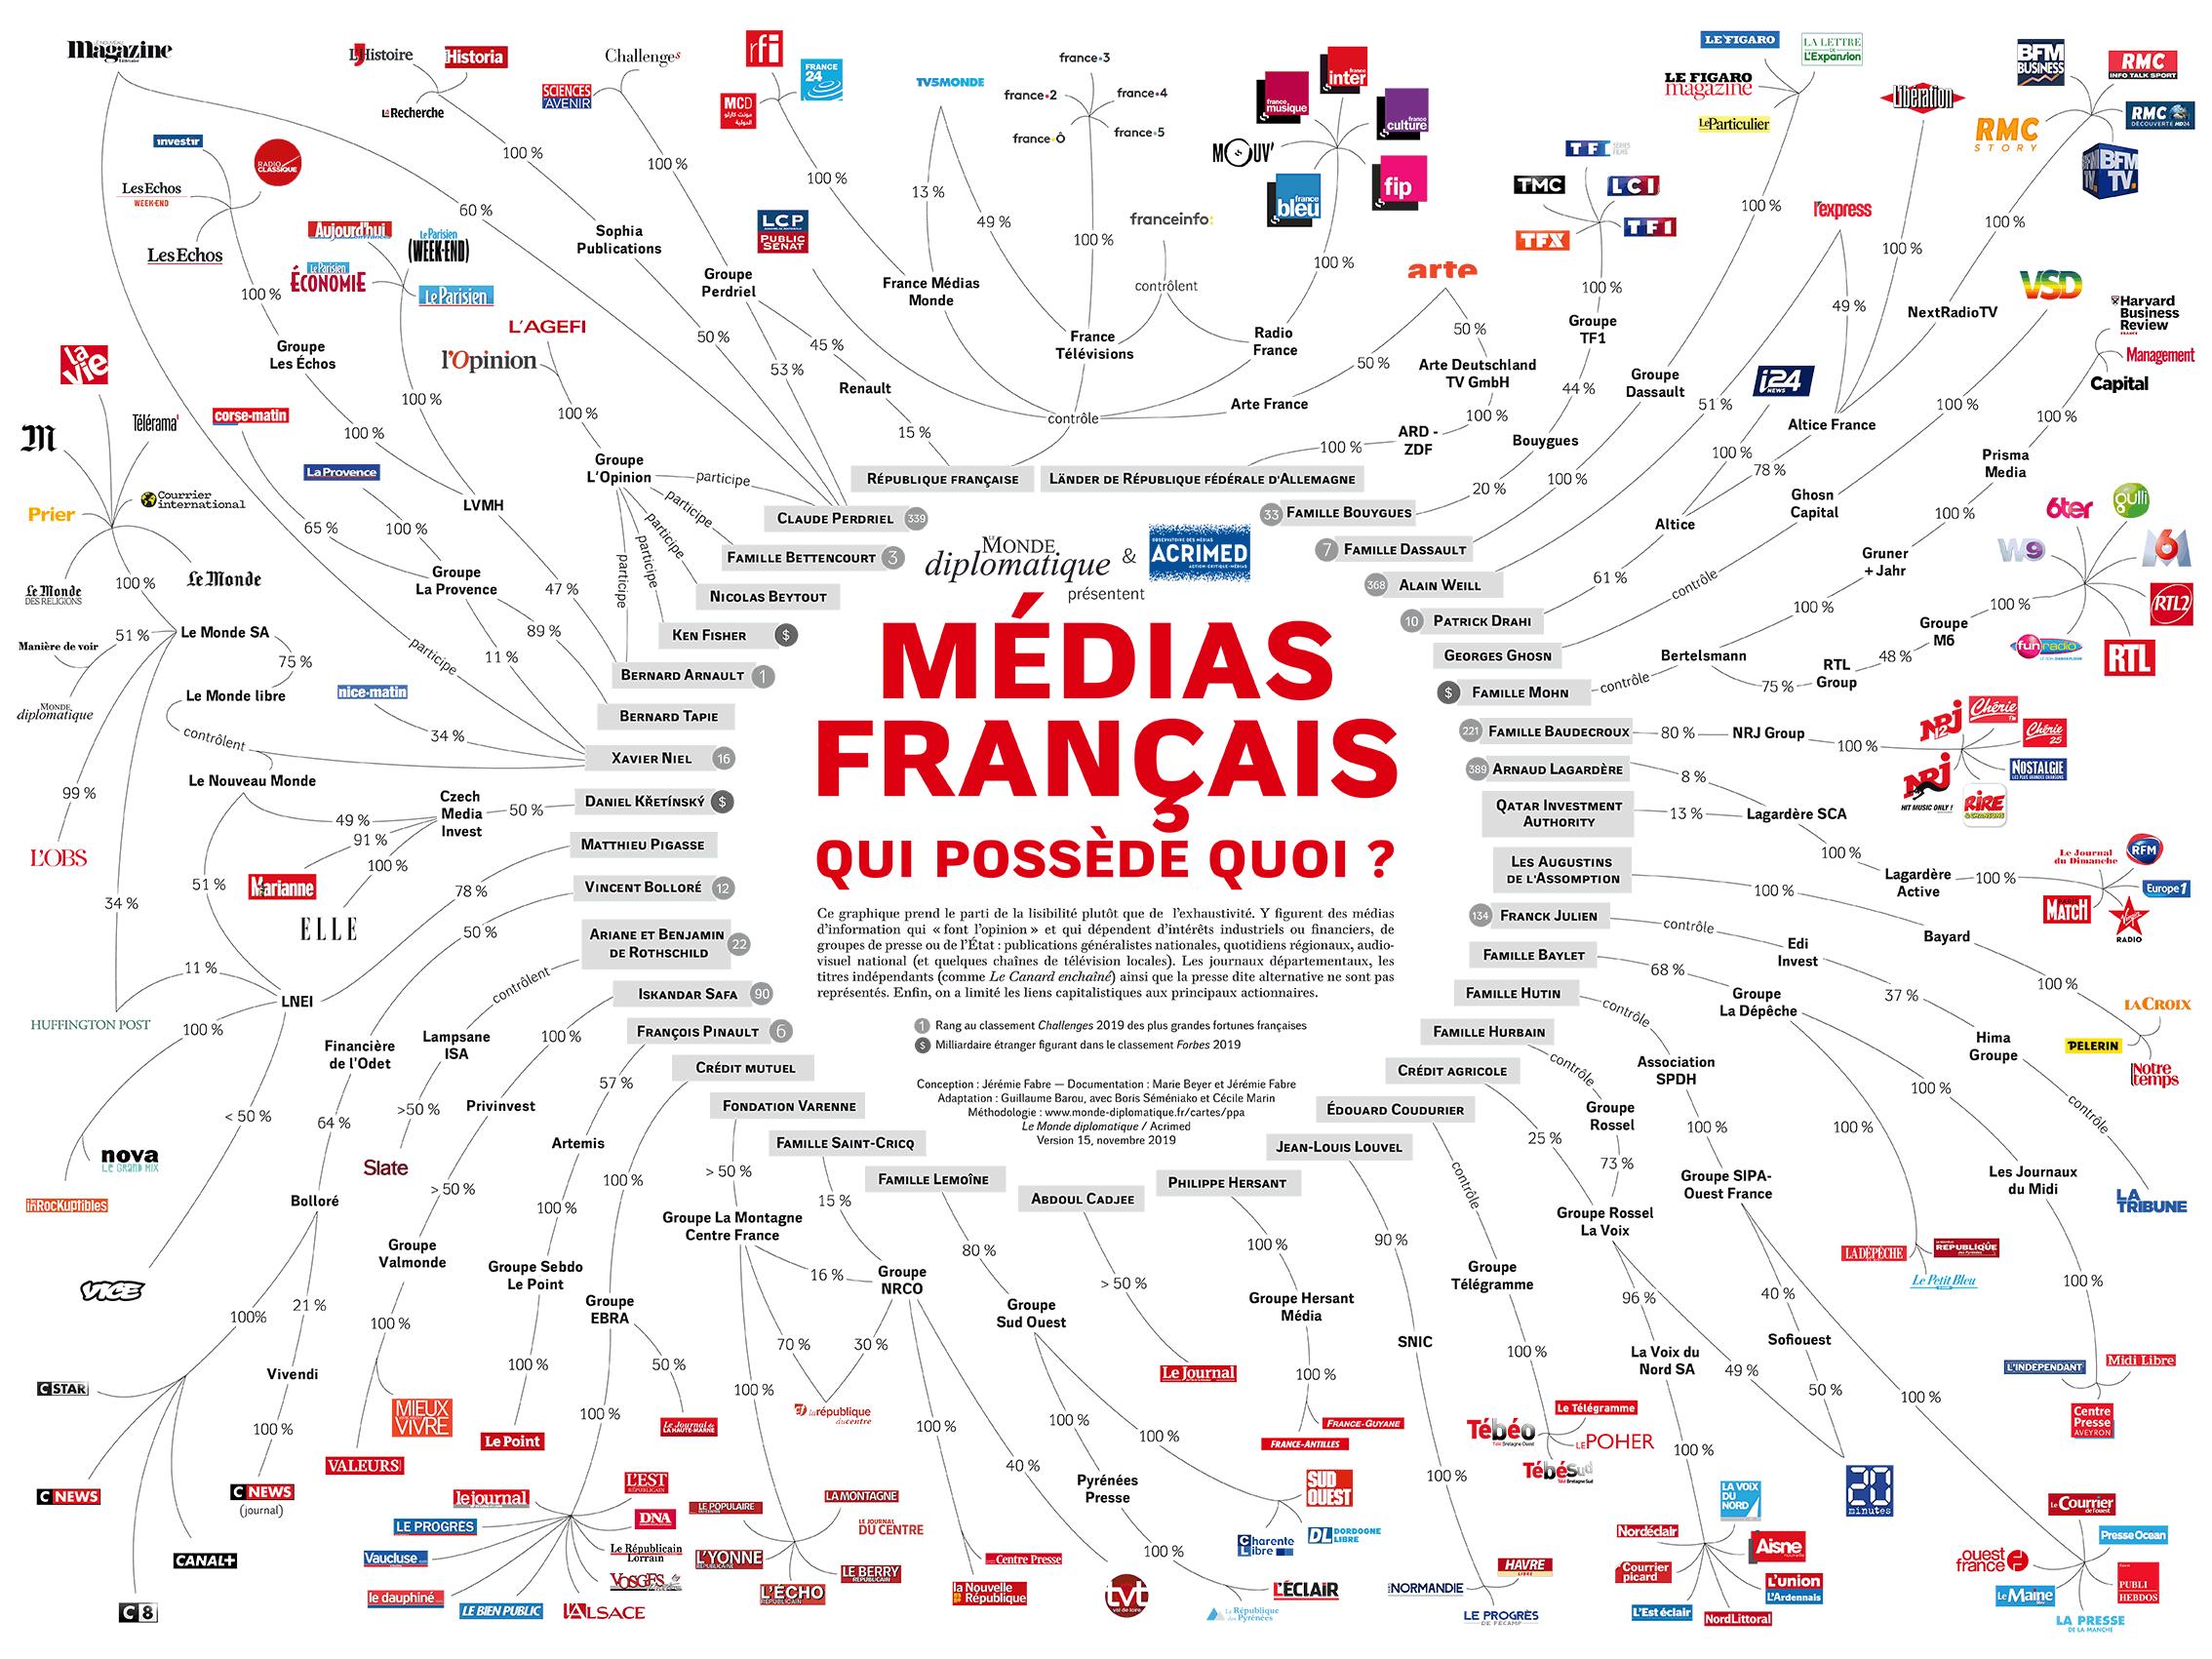 Presse française - Qui possède quoi